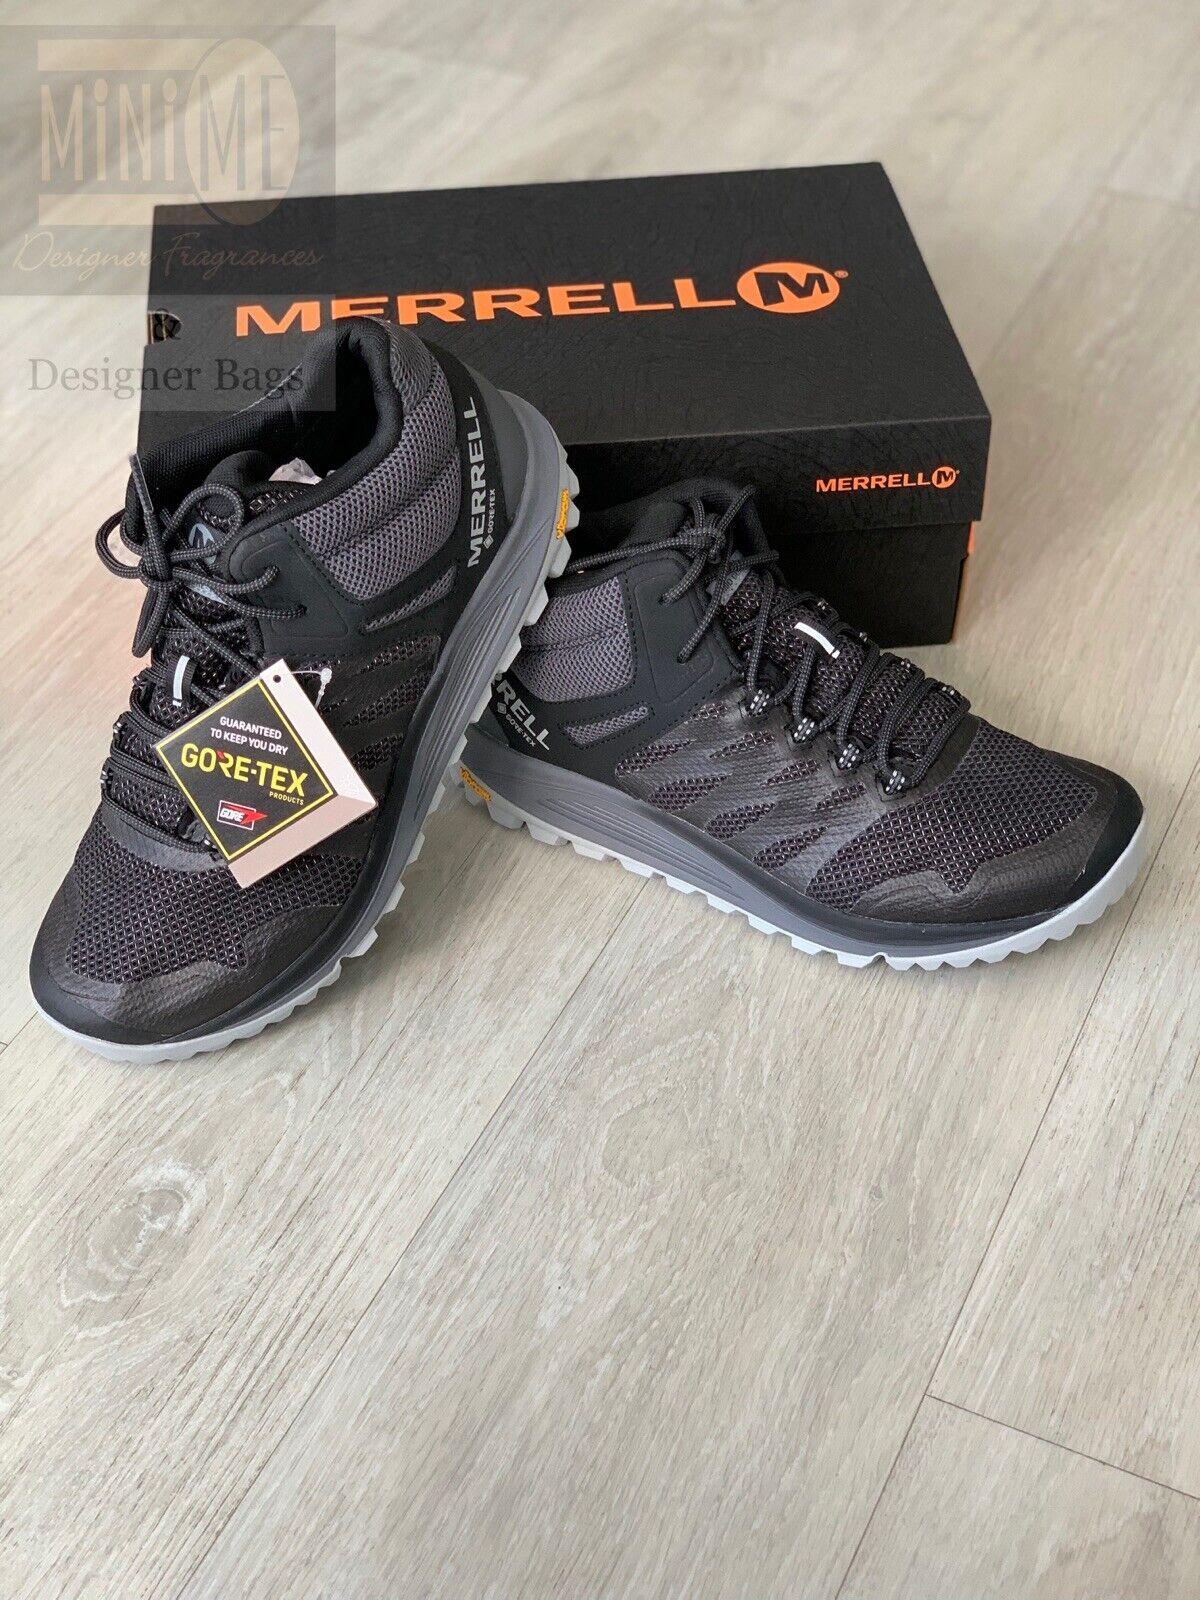 Merrell Nova 2 GTX Mens Waterproof Gore-Tex Walking Trainers Shoes Size U.K. 7.5